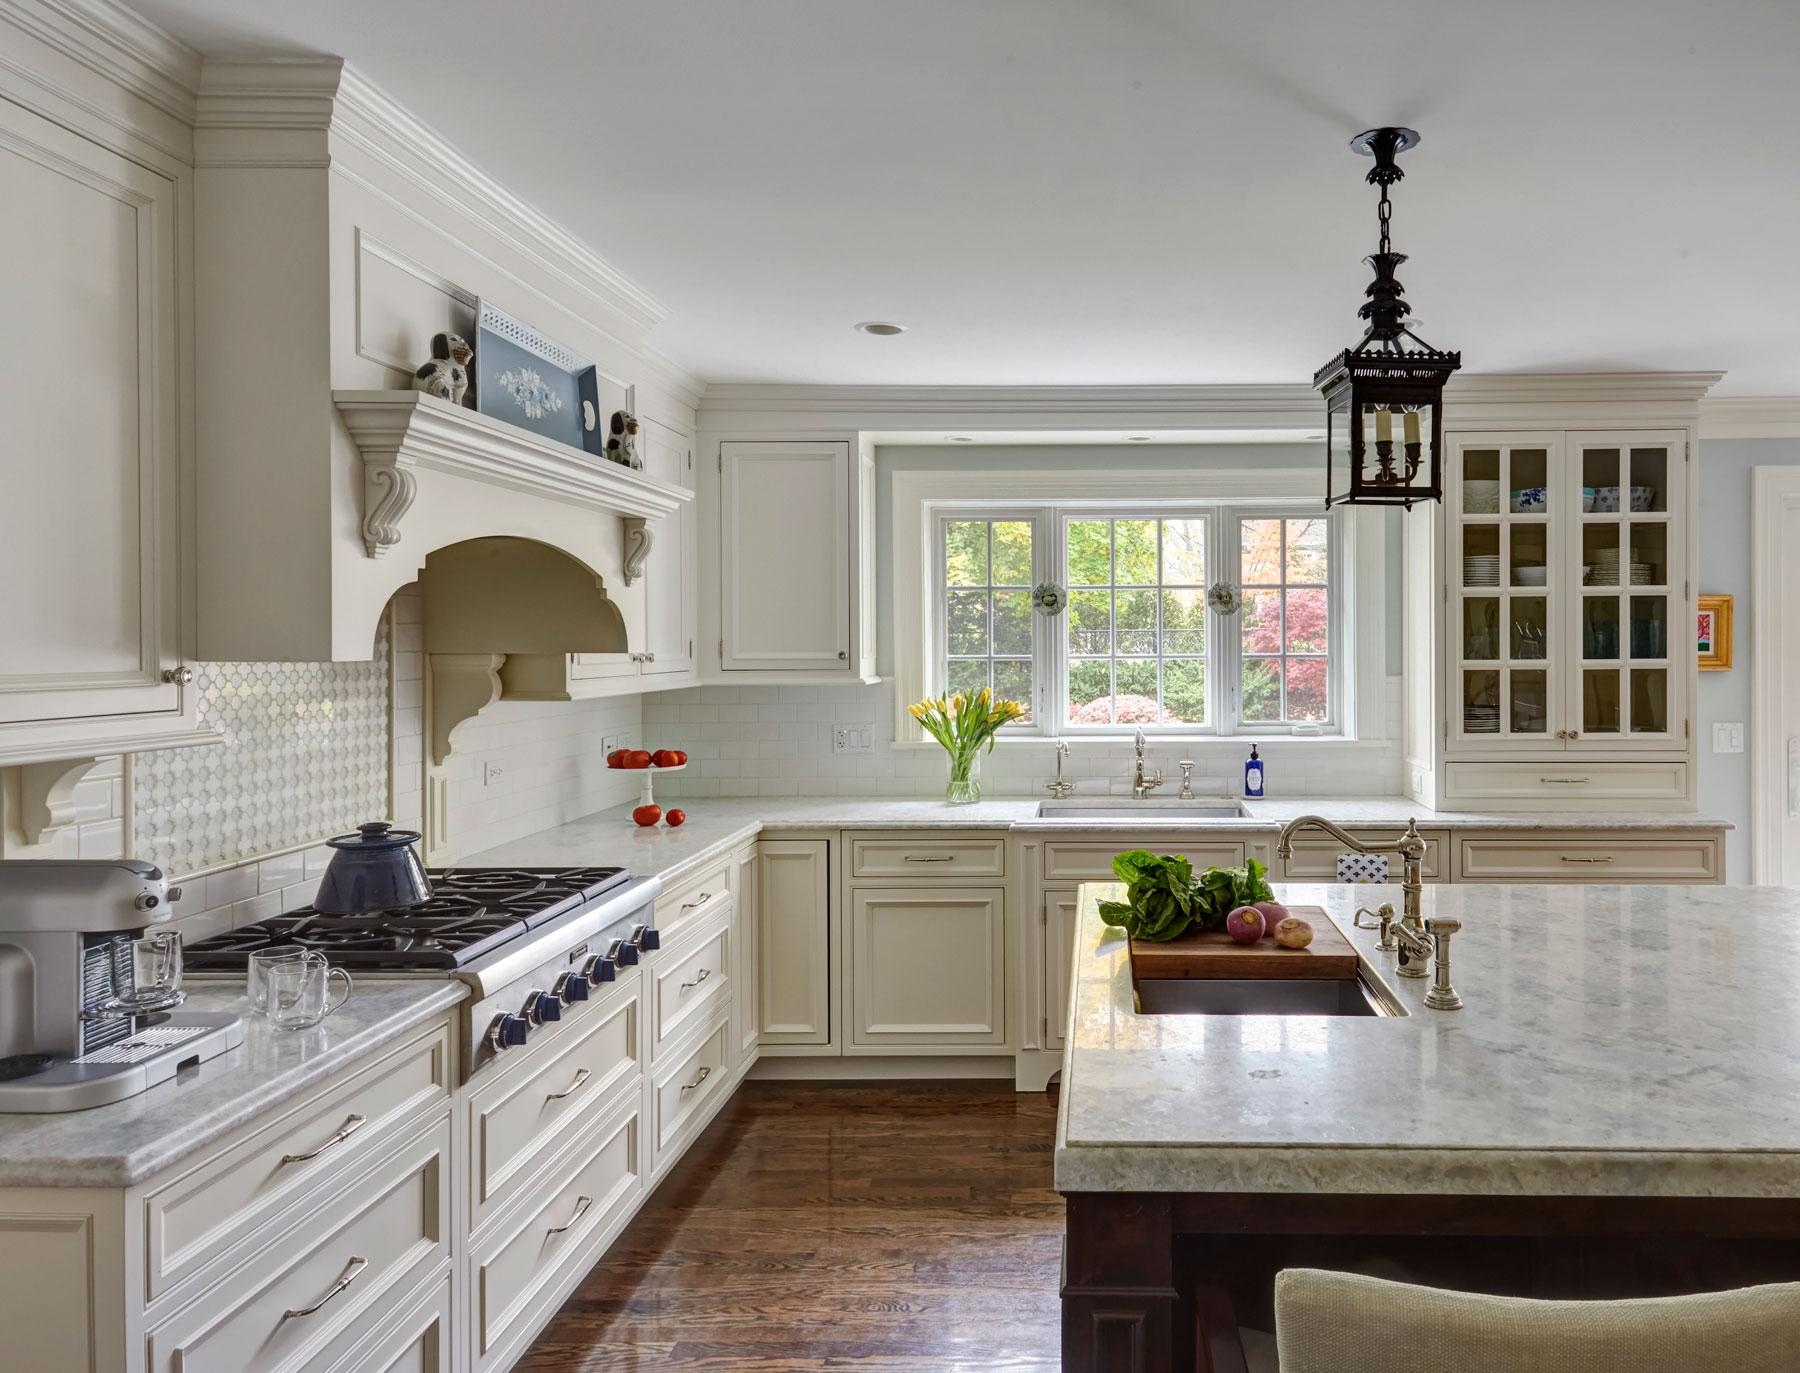 designer kitchens u0026 baths WRMEQFM